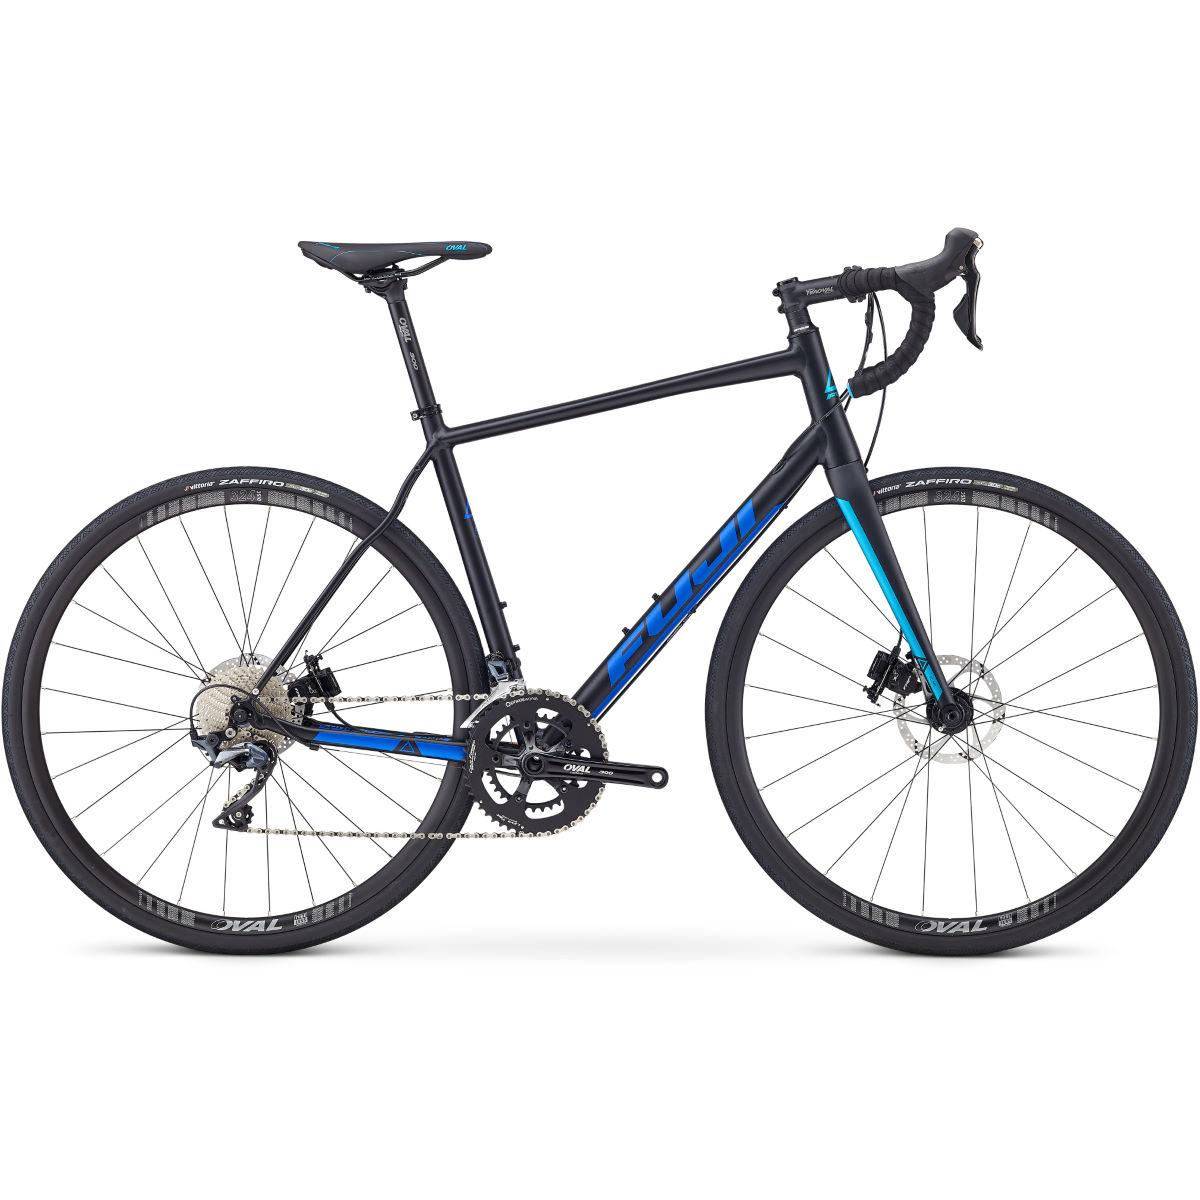 Fuji Sportif 1.3 Disc 2019 Bikes